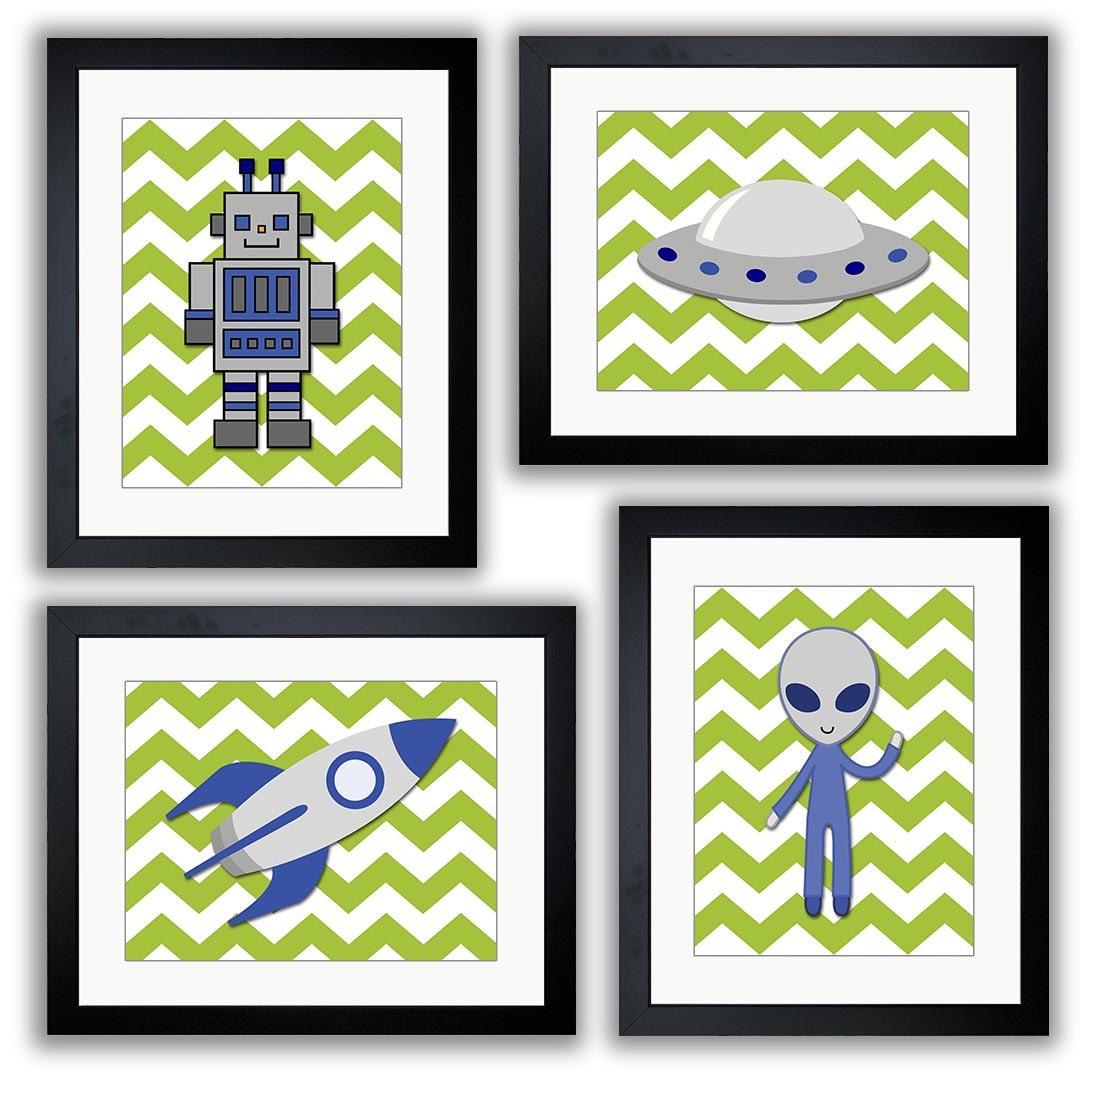 Space Art Child Art Prints Green Alien Spaceship Rocket Robot Boy Kids Room Wall Art Decor Set of 4